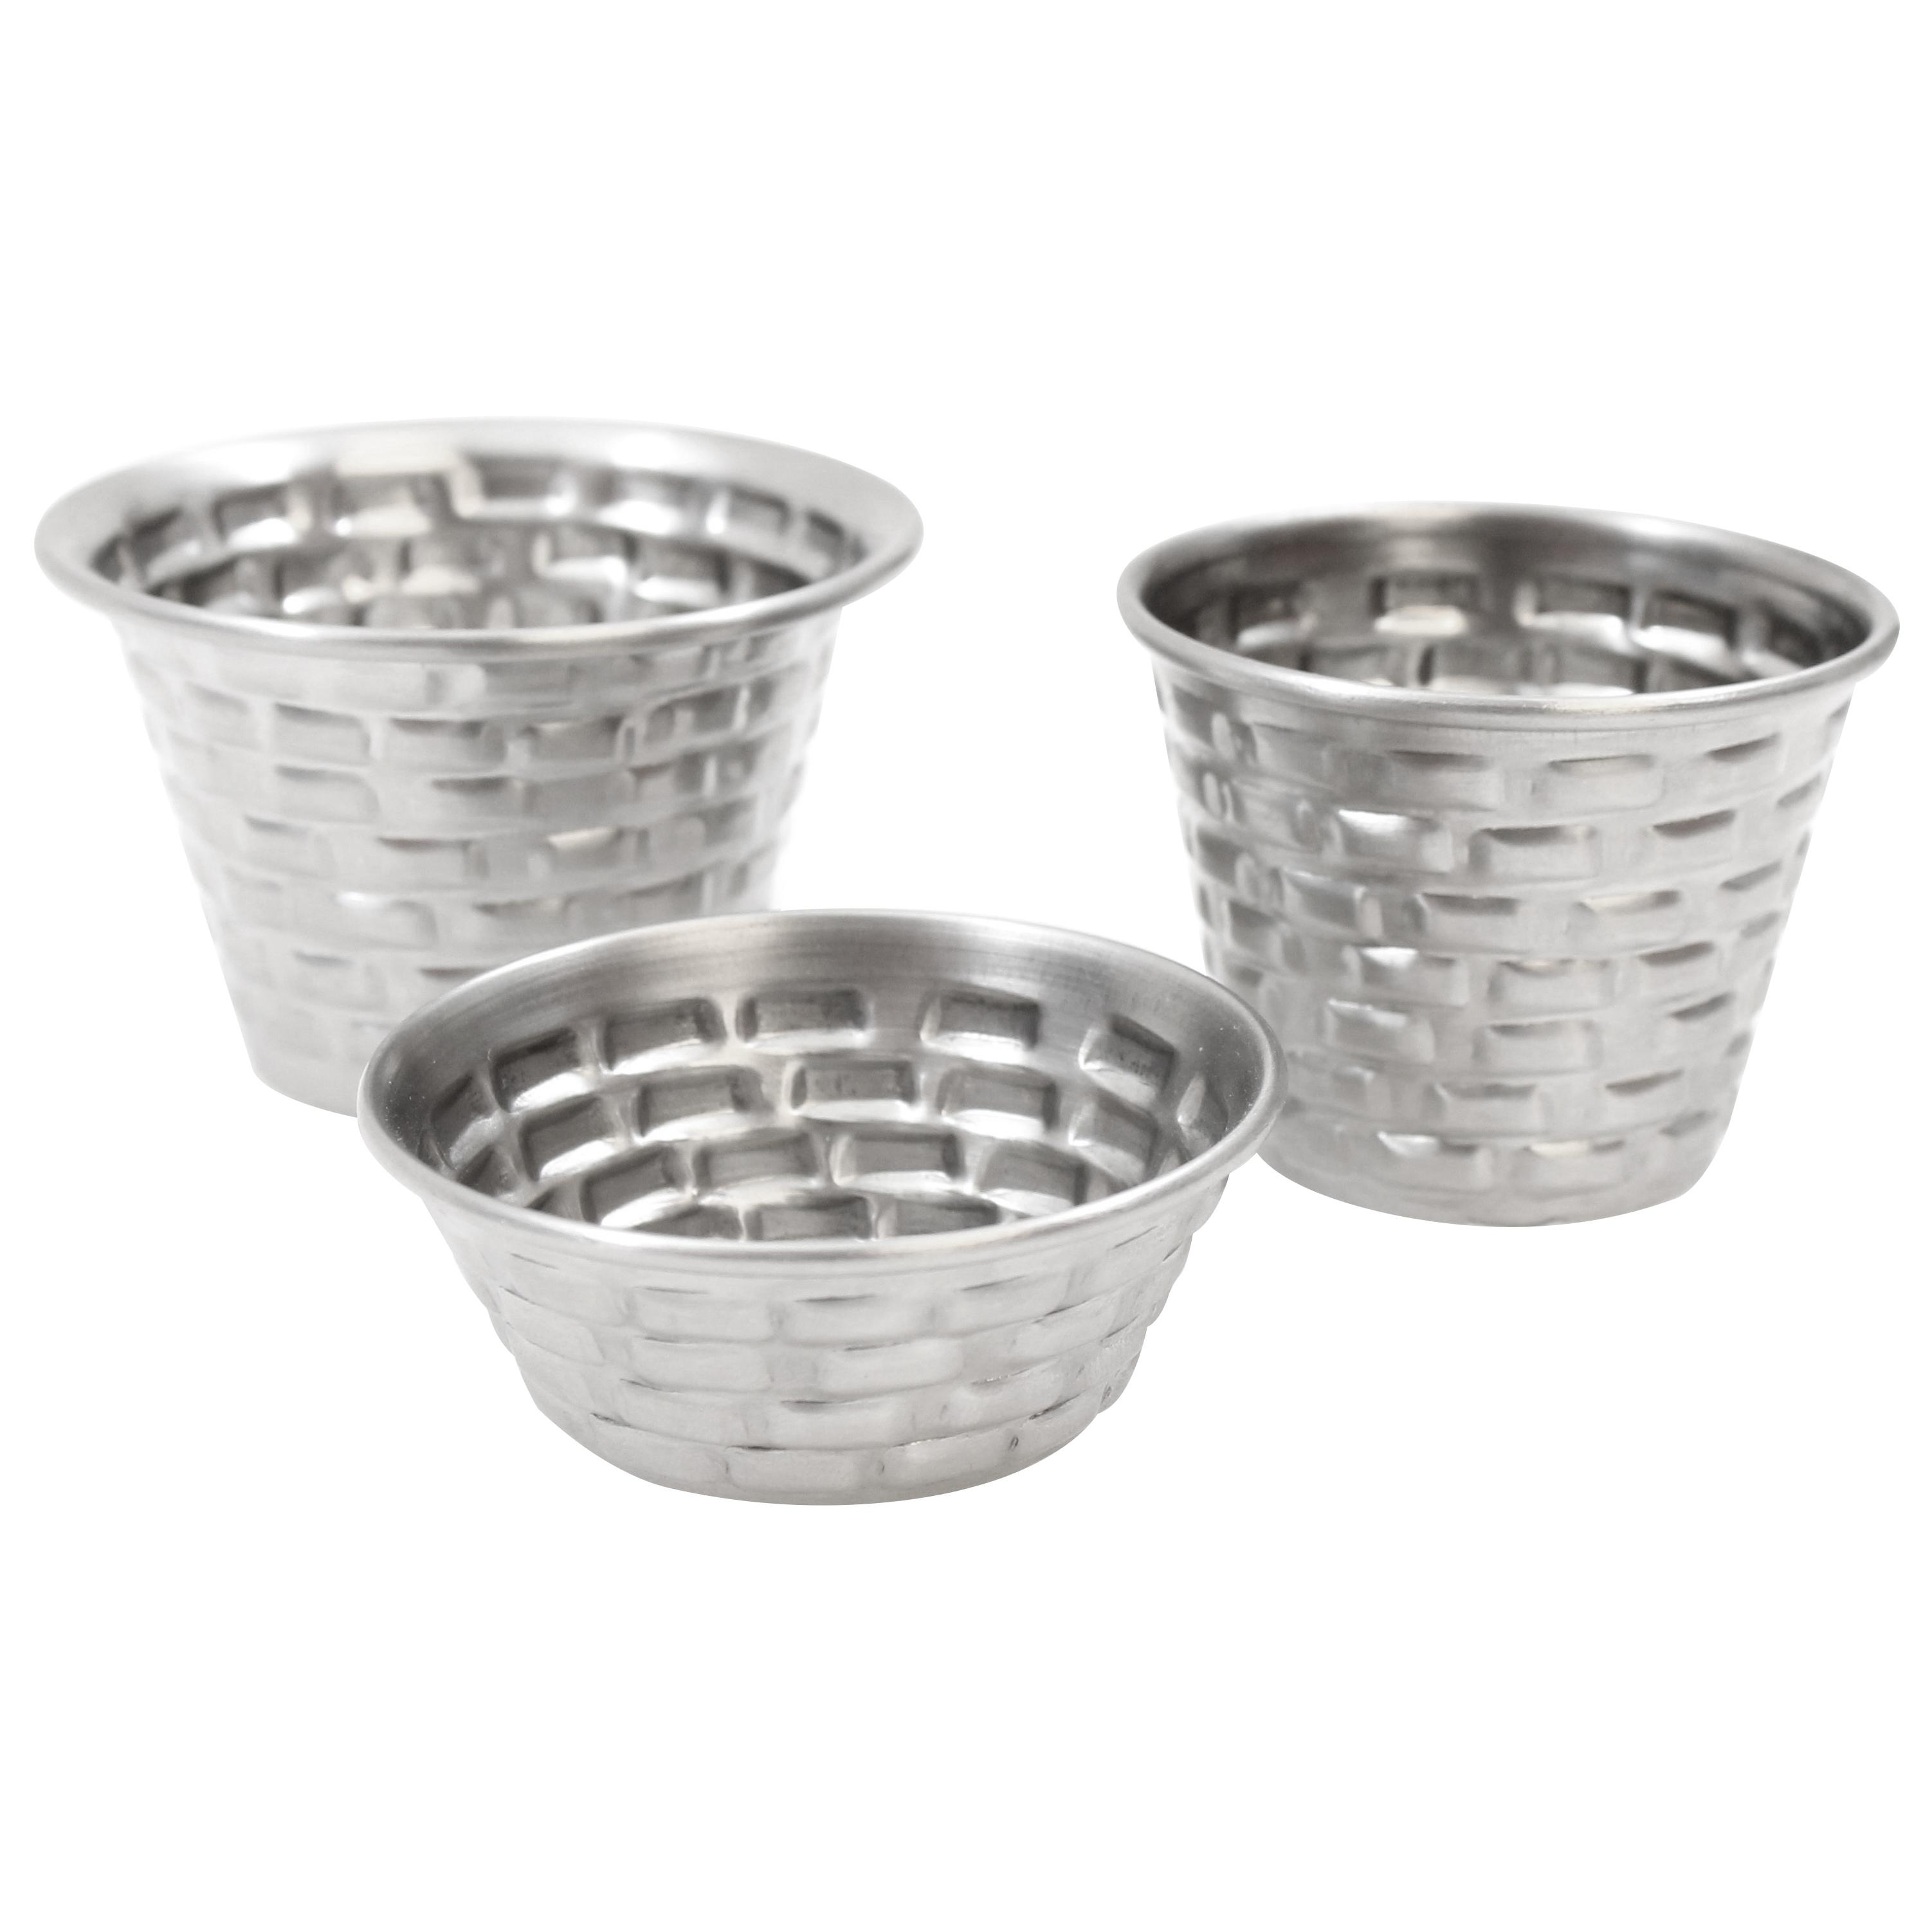 TableCraft Products GRSS2 ramekin / sauce cup, metal